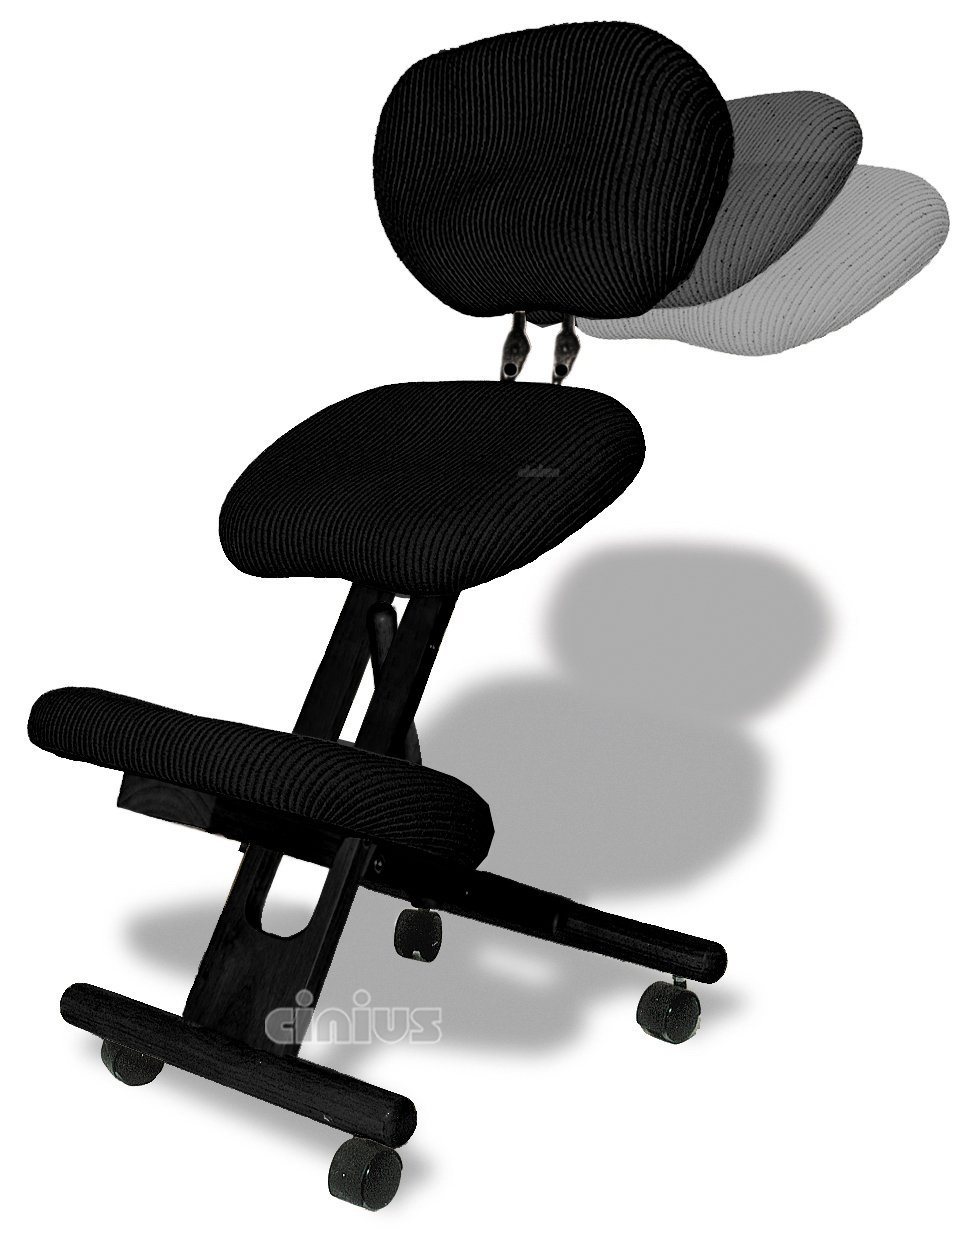 sedia ergonomica - Vivere in Forma